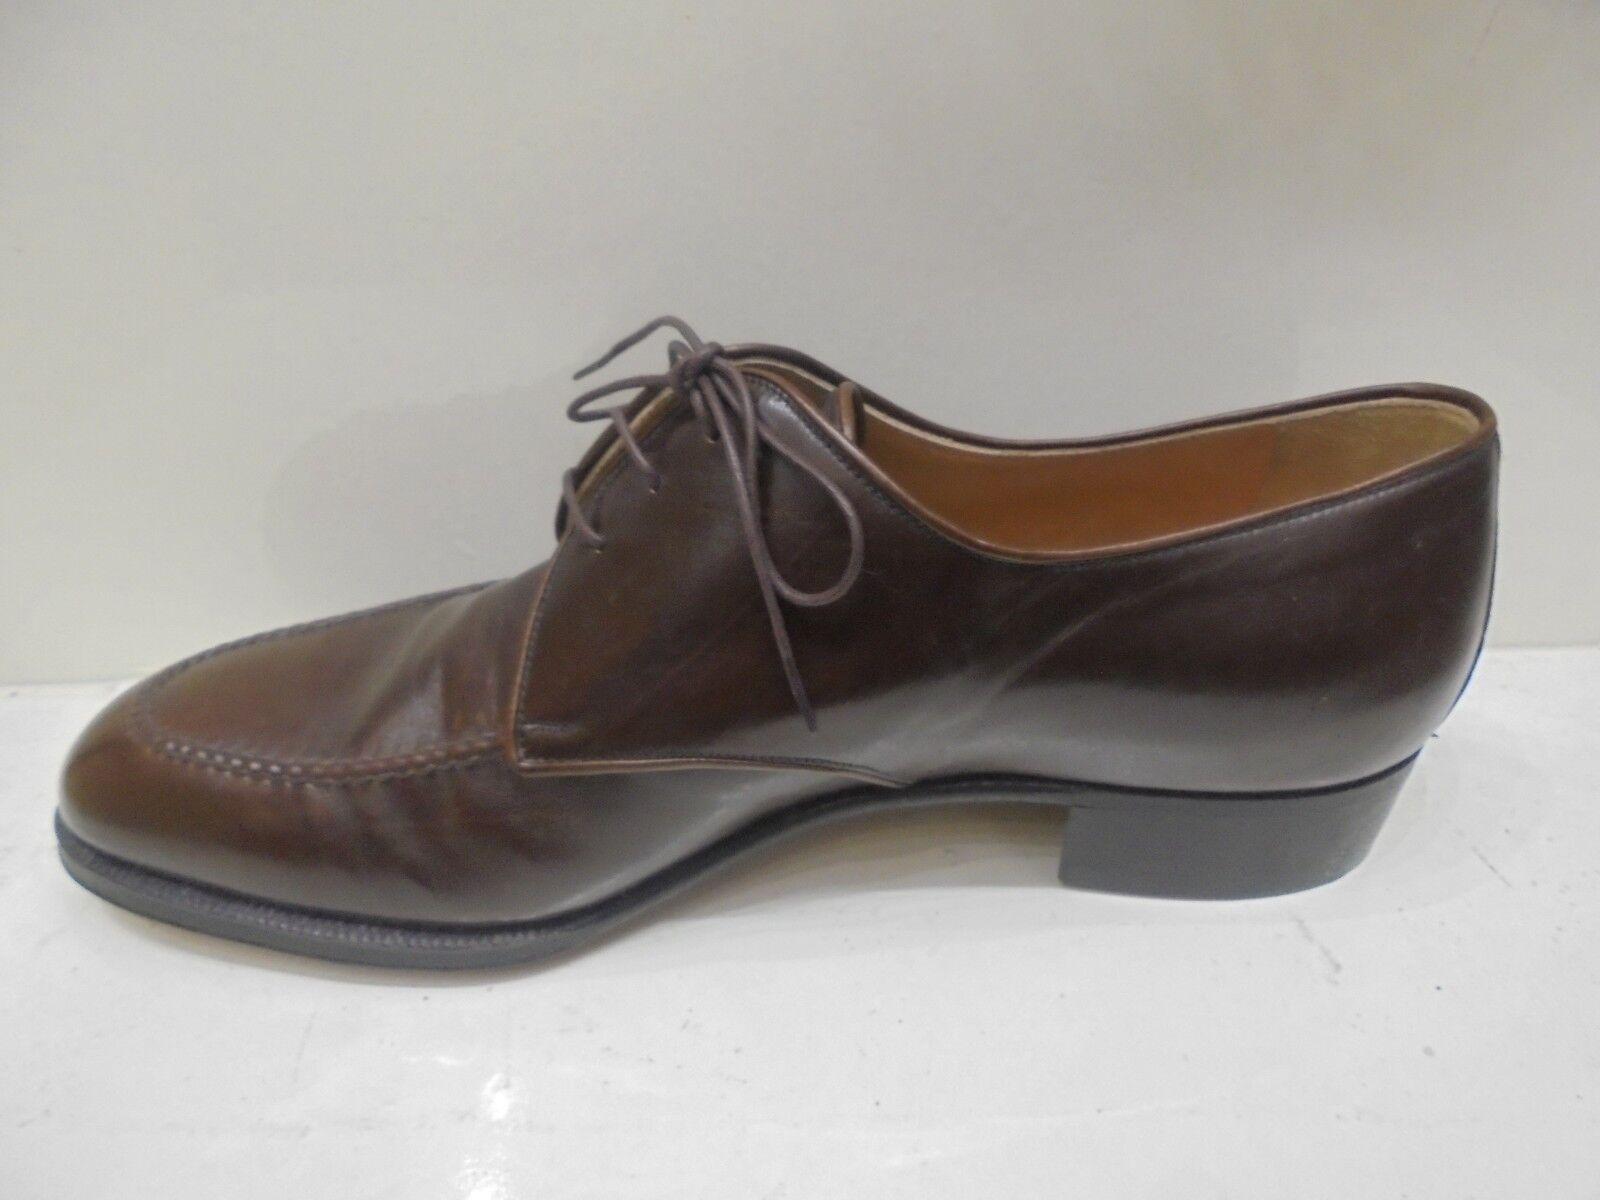 shoes men ARTIGIANALI ARTIGIANALI ARTIGIANALI VERO CUOIO E PELLE MADE ITALY ALTA QUALITA'  BOLOGNESE  46d5f4